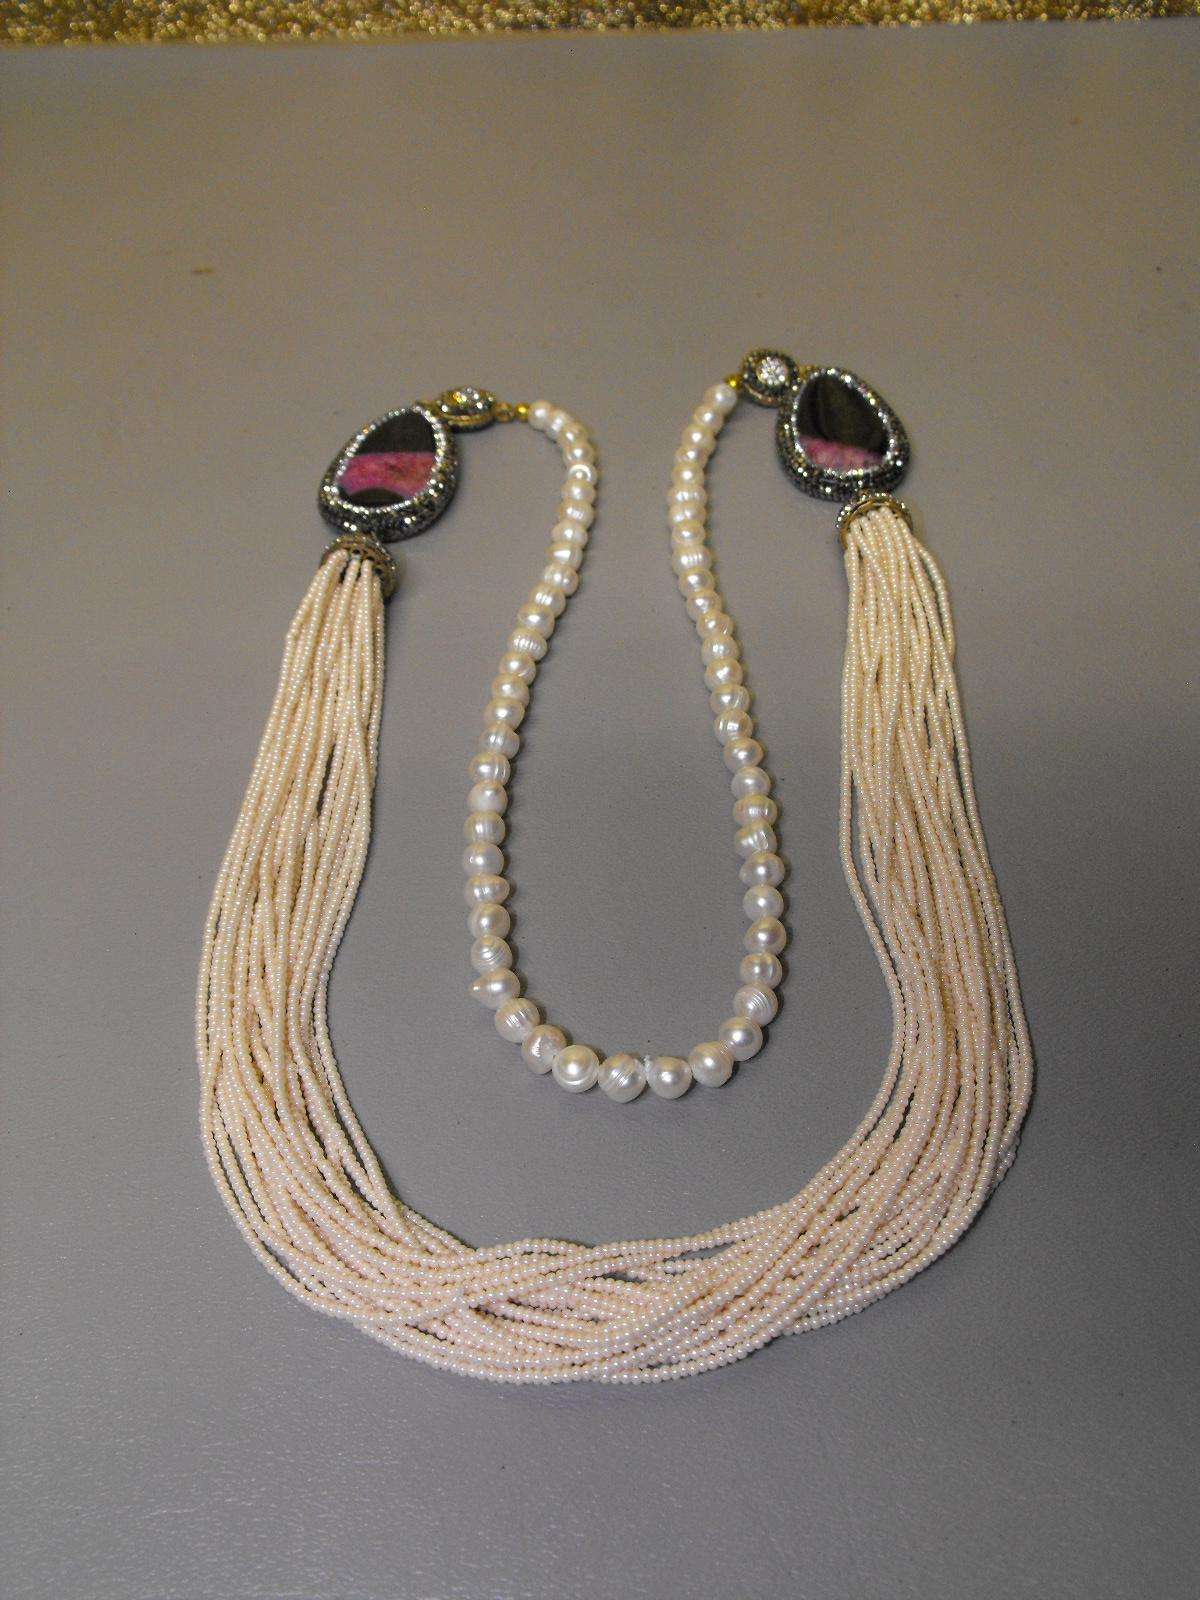 Sautoir Of Seed Pearls Freshwater Pearls Onyx Amp Amethyst